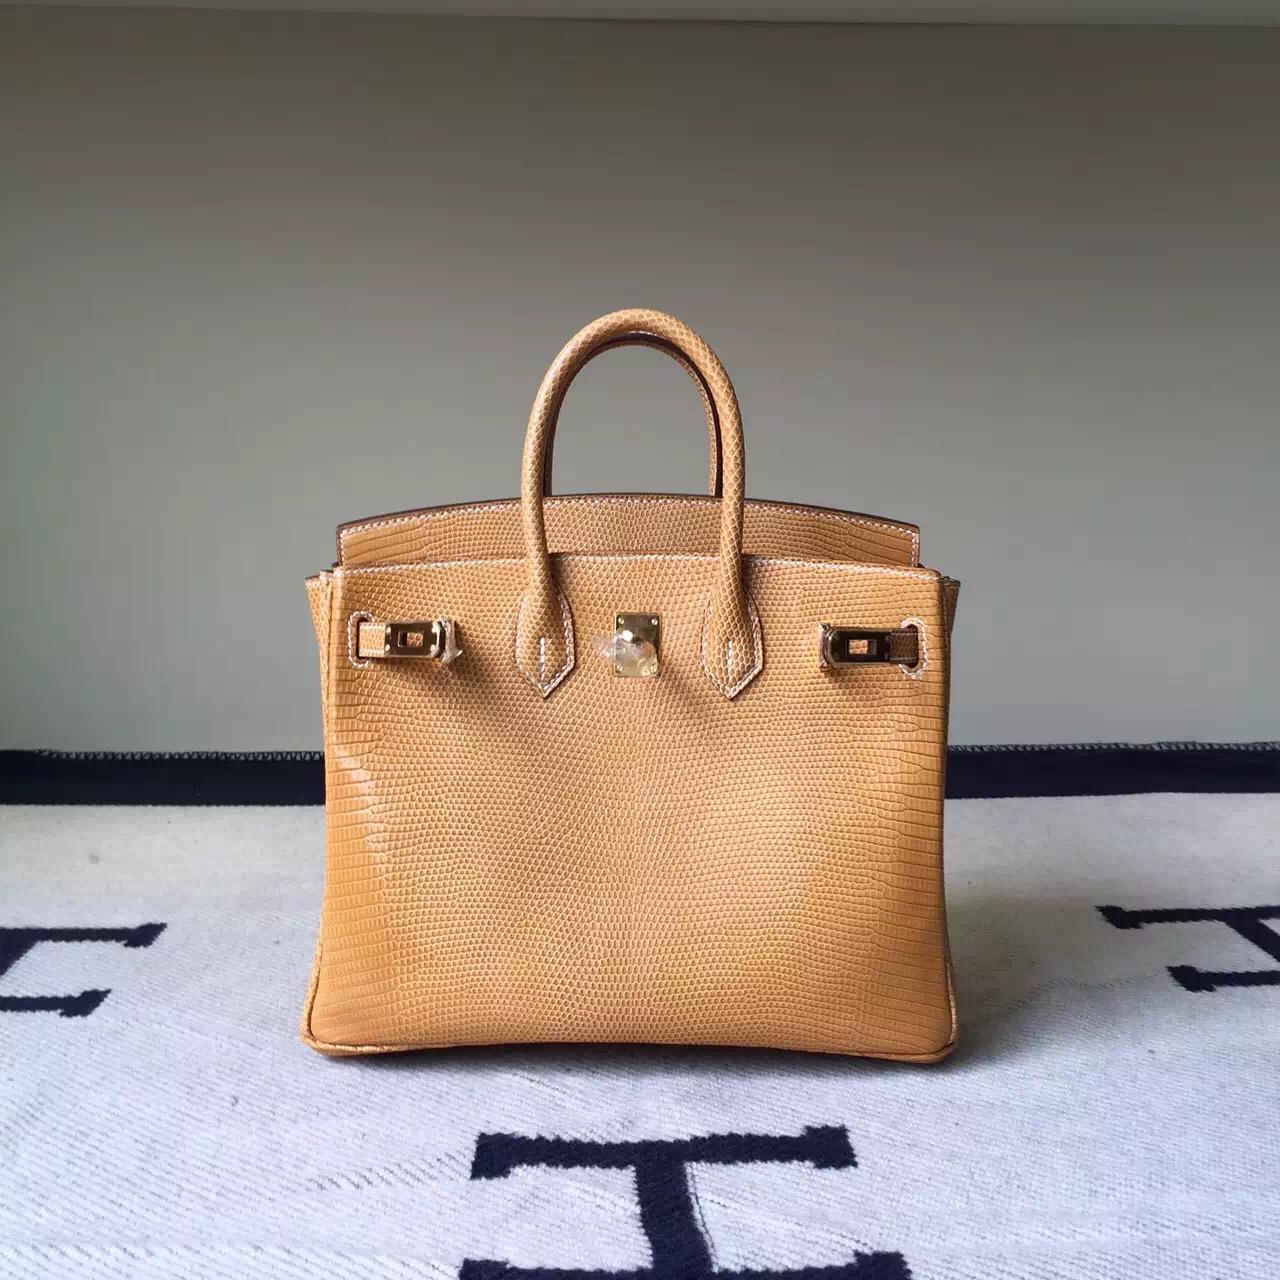 Hand Stitching Hermes 1G Mais Shiny Lizard Leather Birkin Bag 25cm